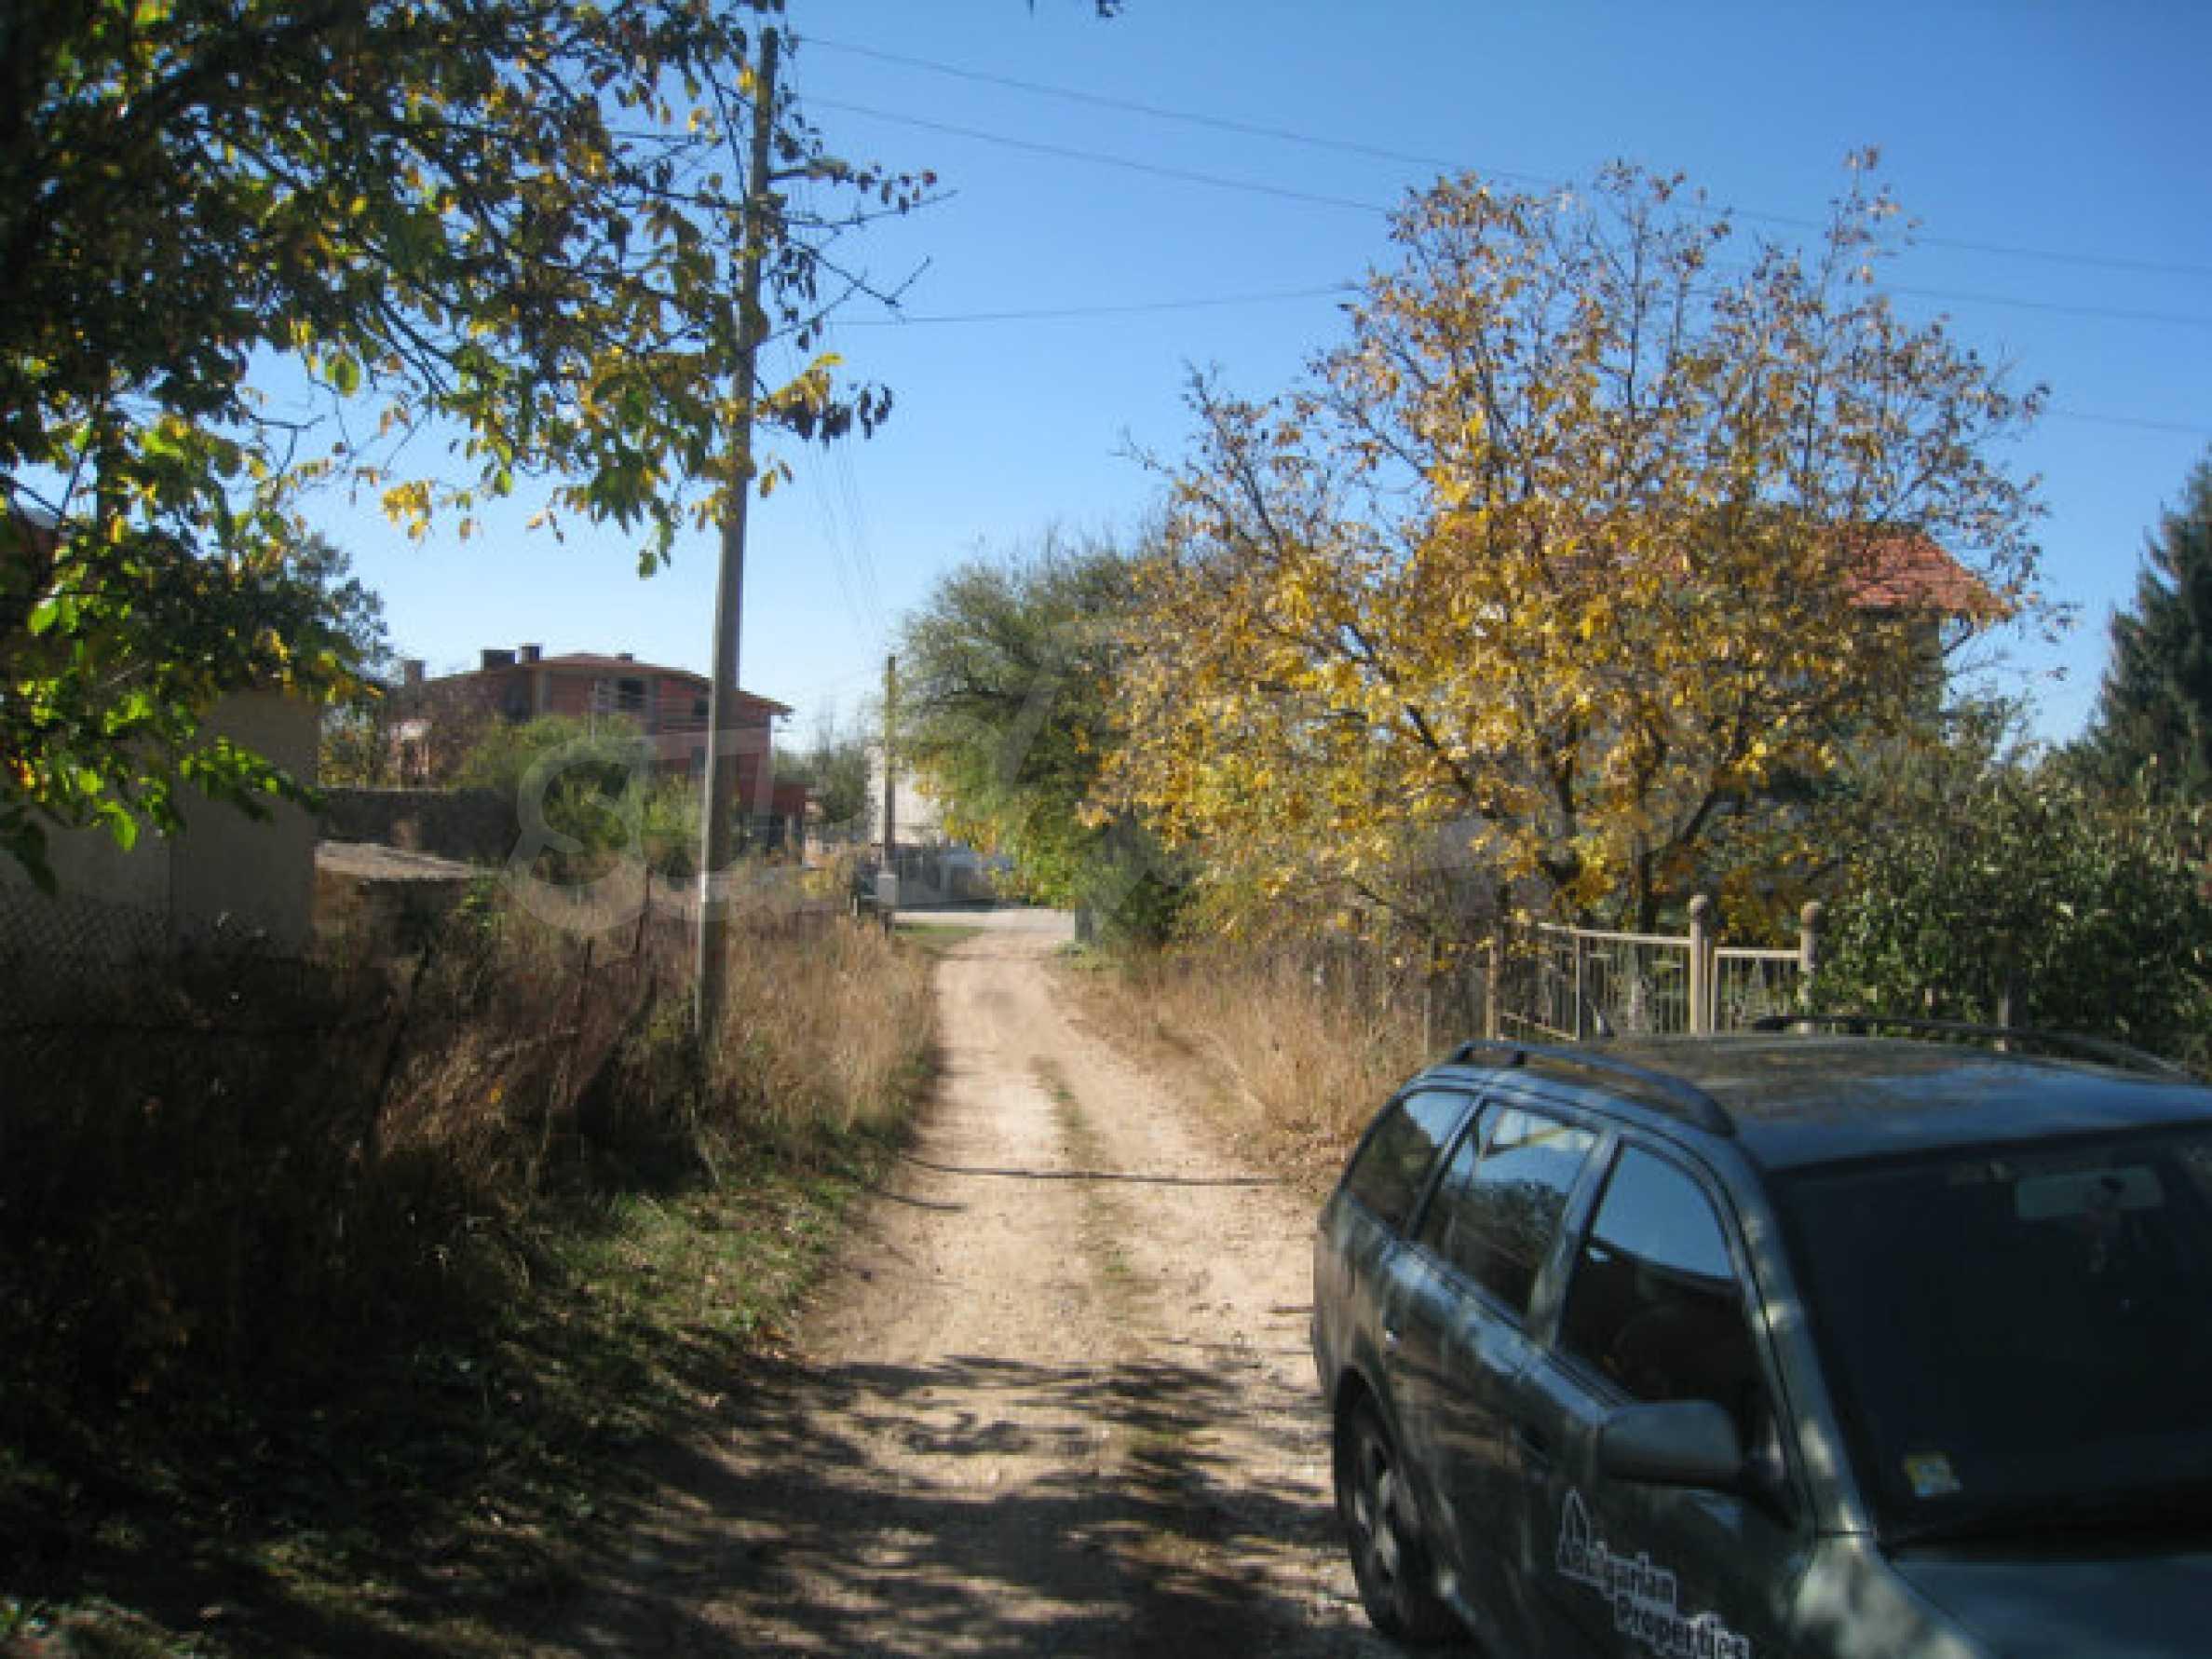 Bargain regulated plot in Ihtiman municipality near the highway and Sofia 13